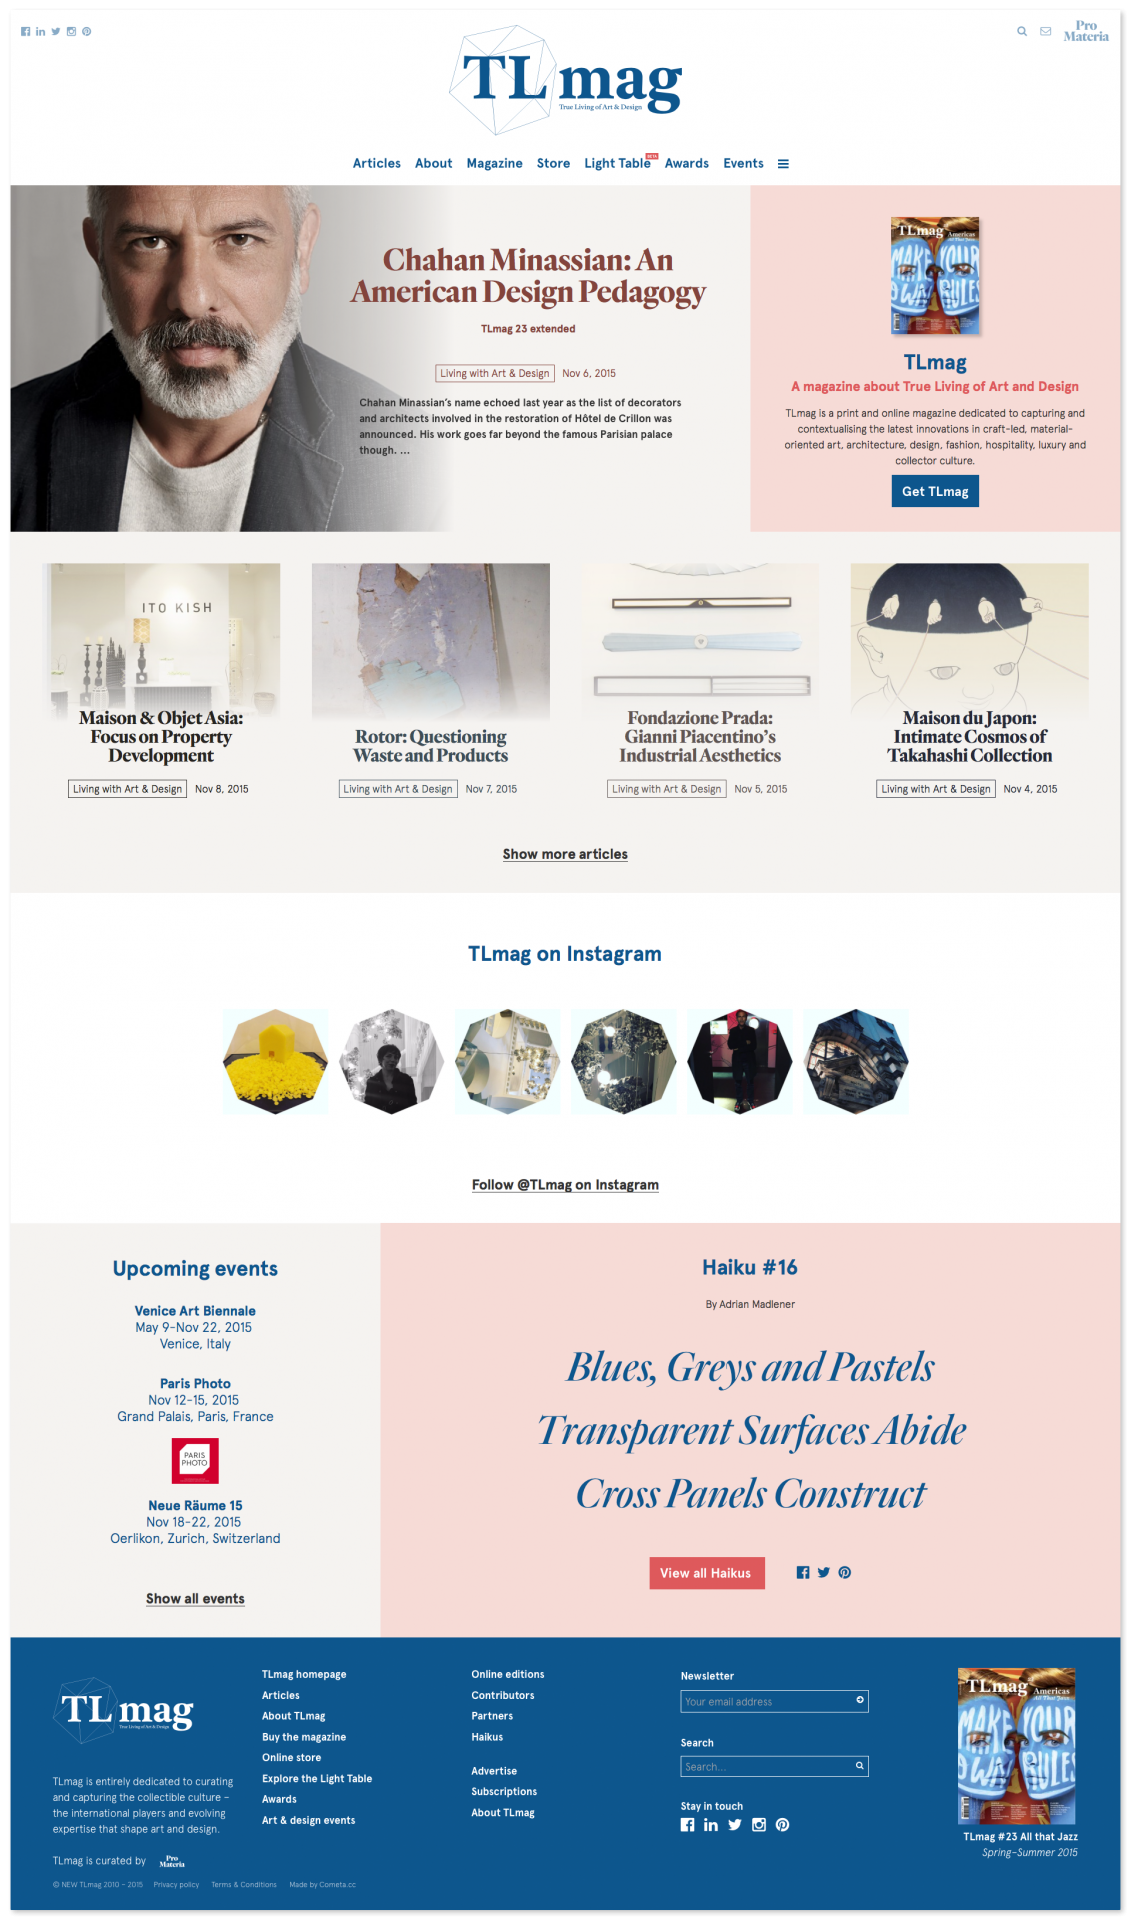 TLM_TLmagazine_screen_20151109